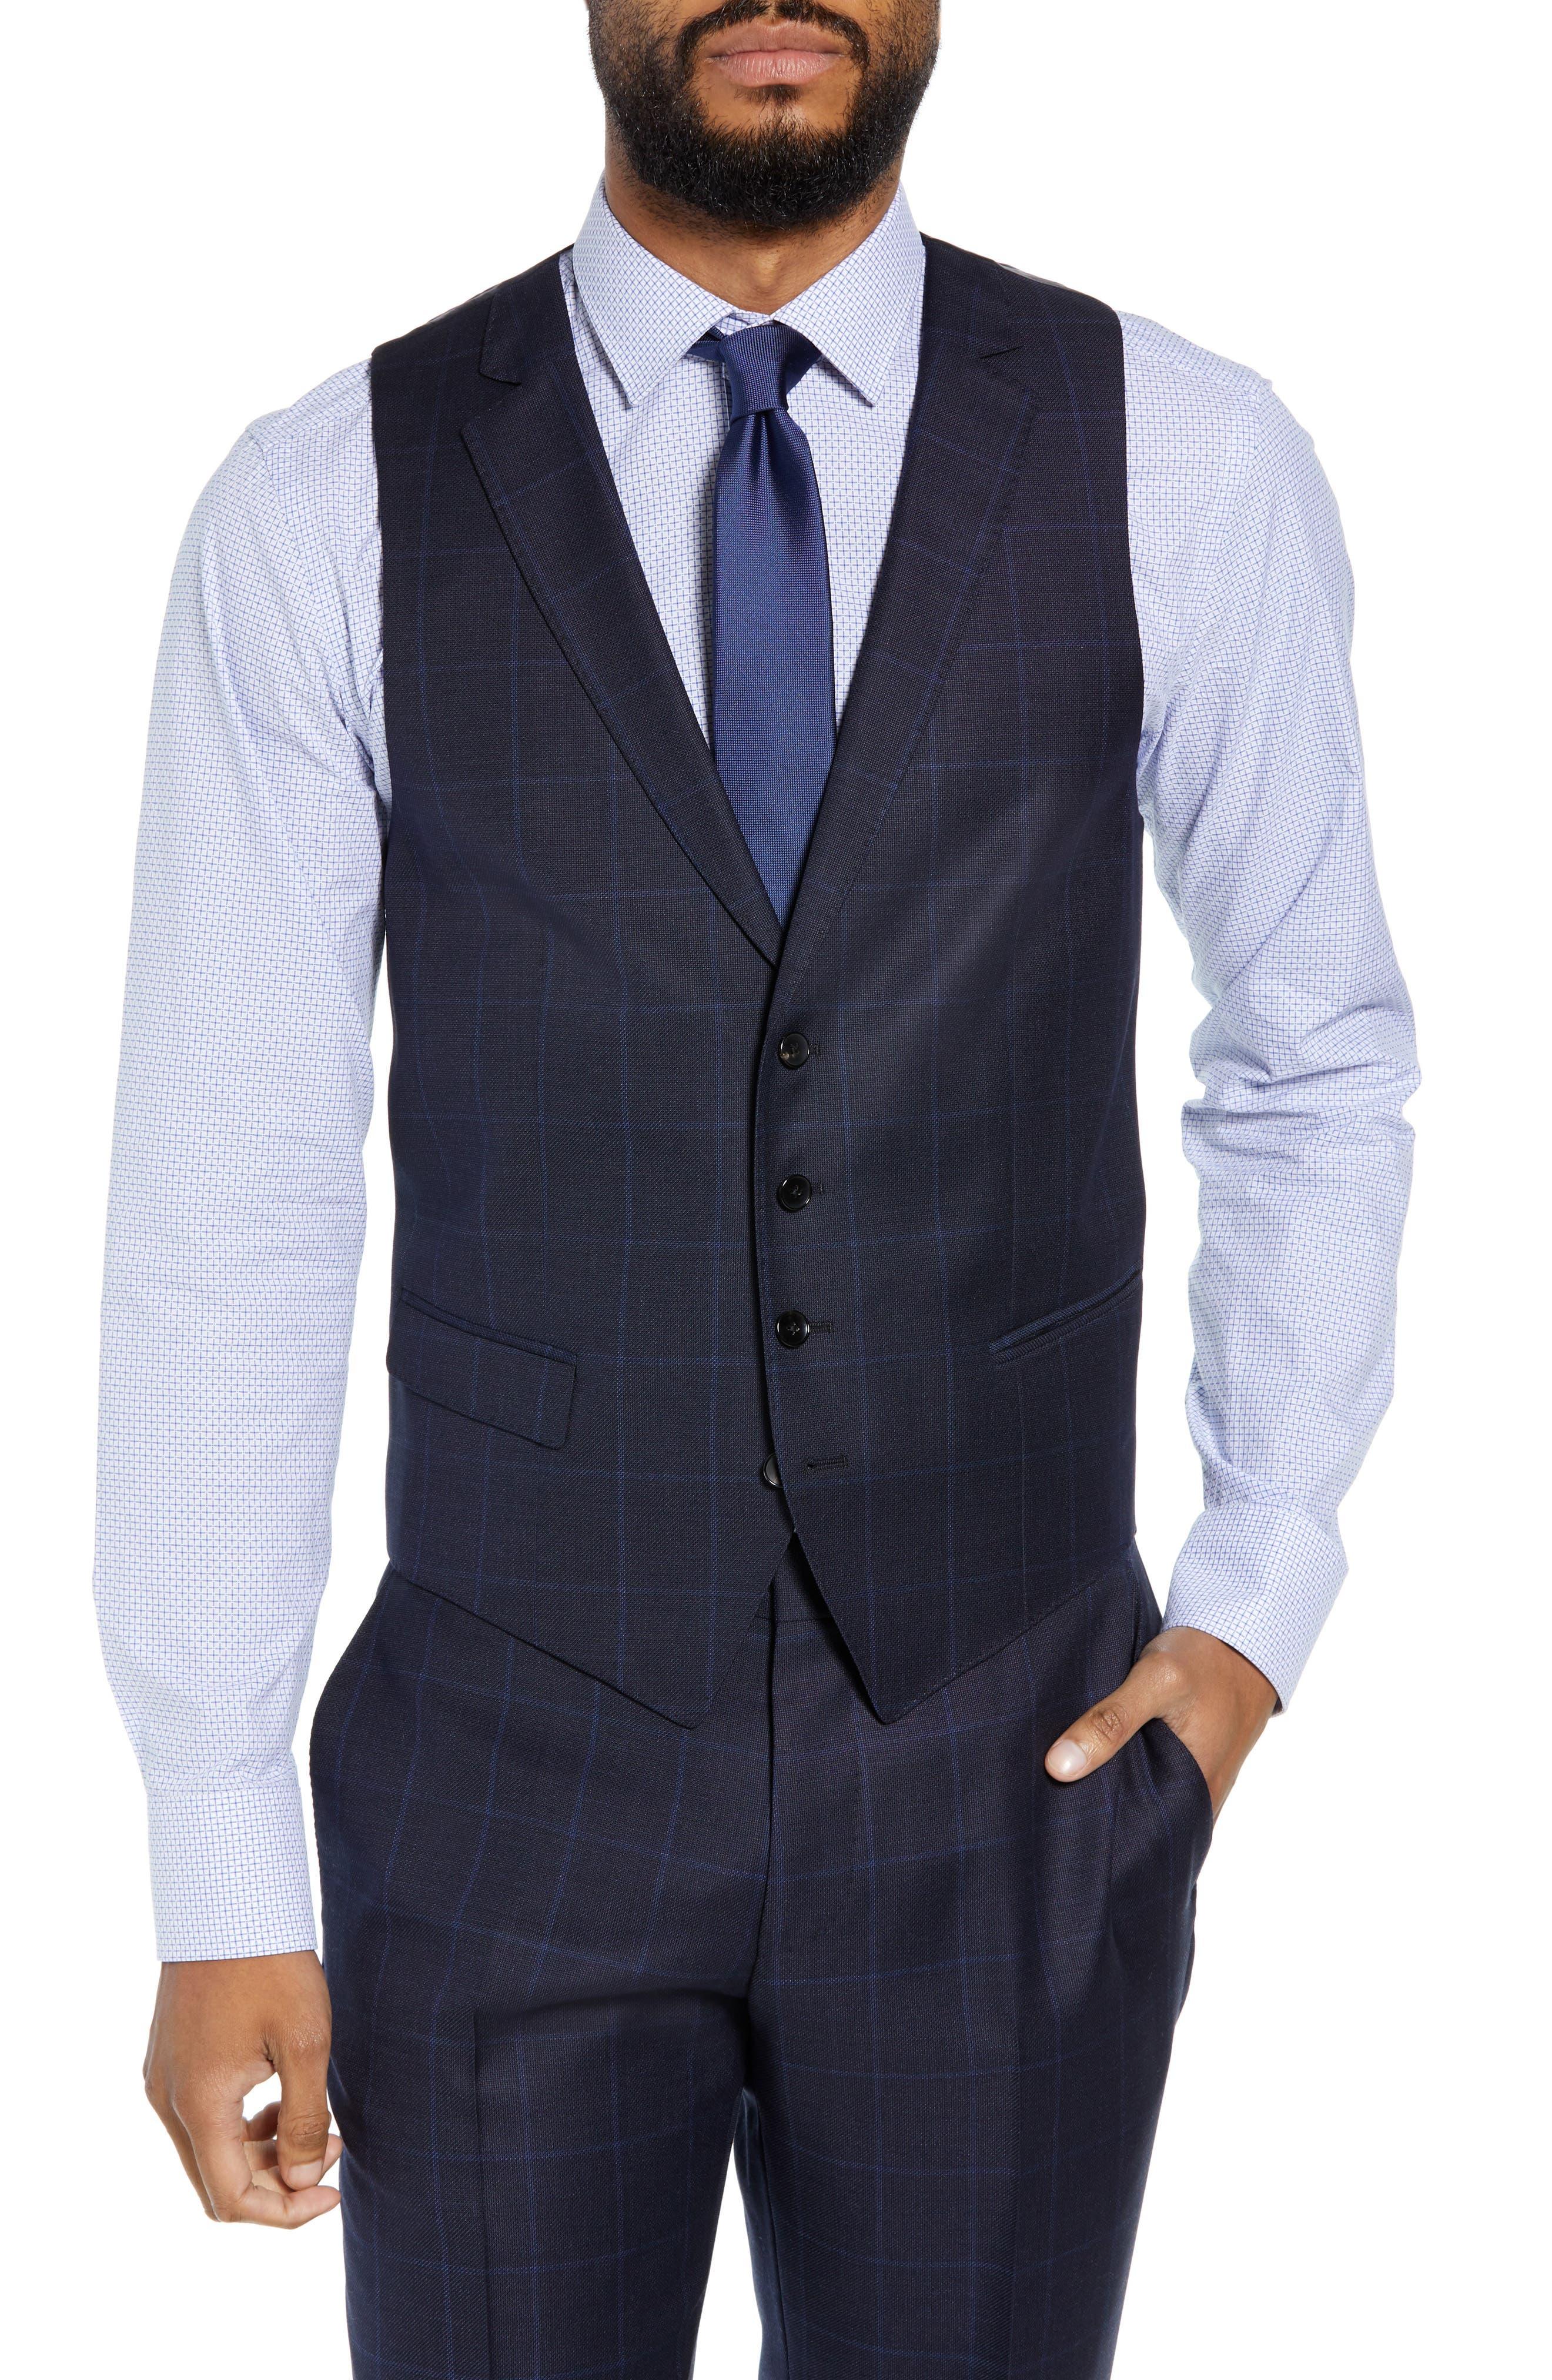 Huge/Genius Trim Fit Windowpane Wool Three-Piece Suit,                             Main thumbnail 1, color,                             480